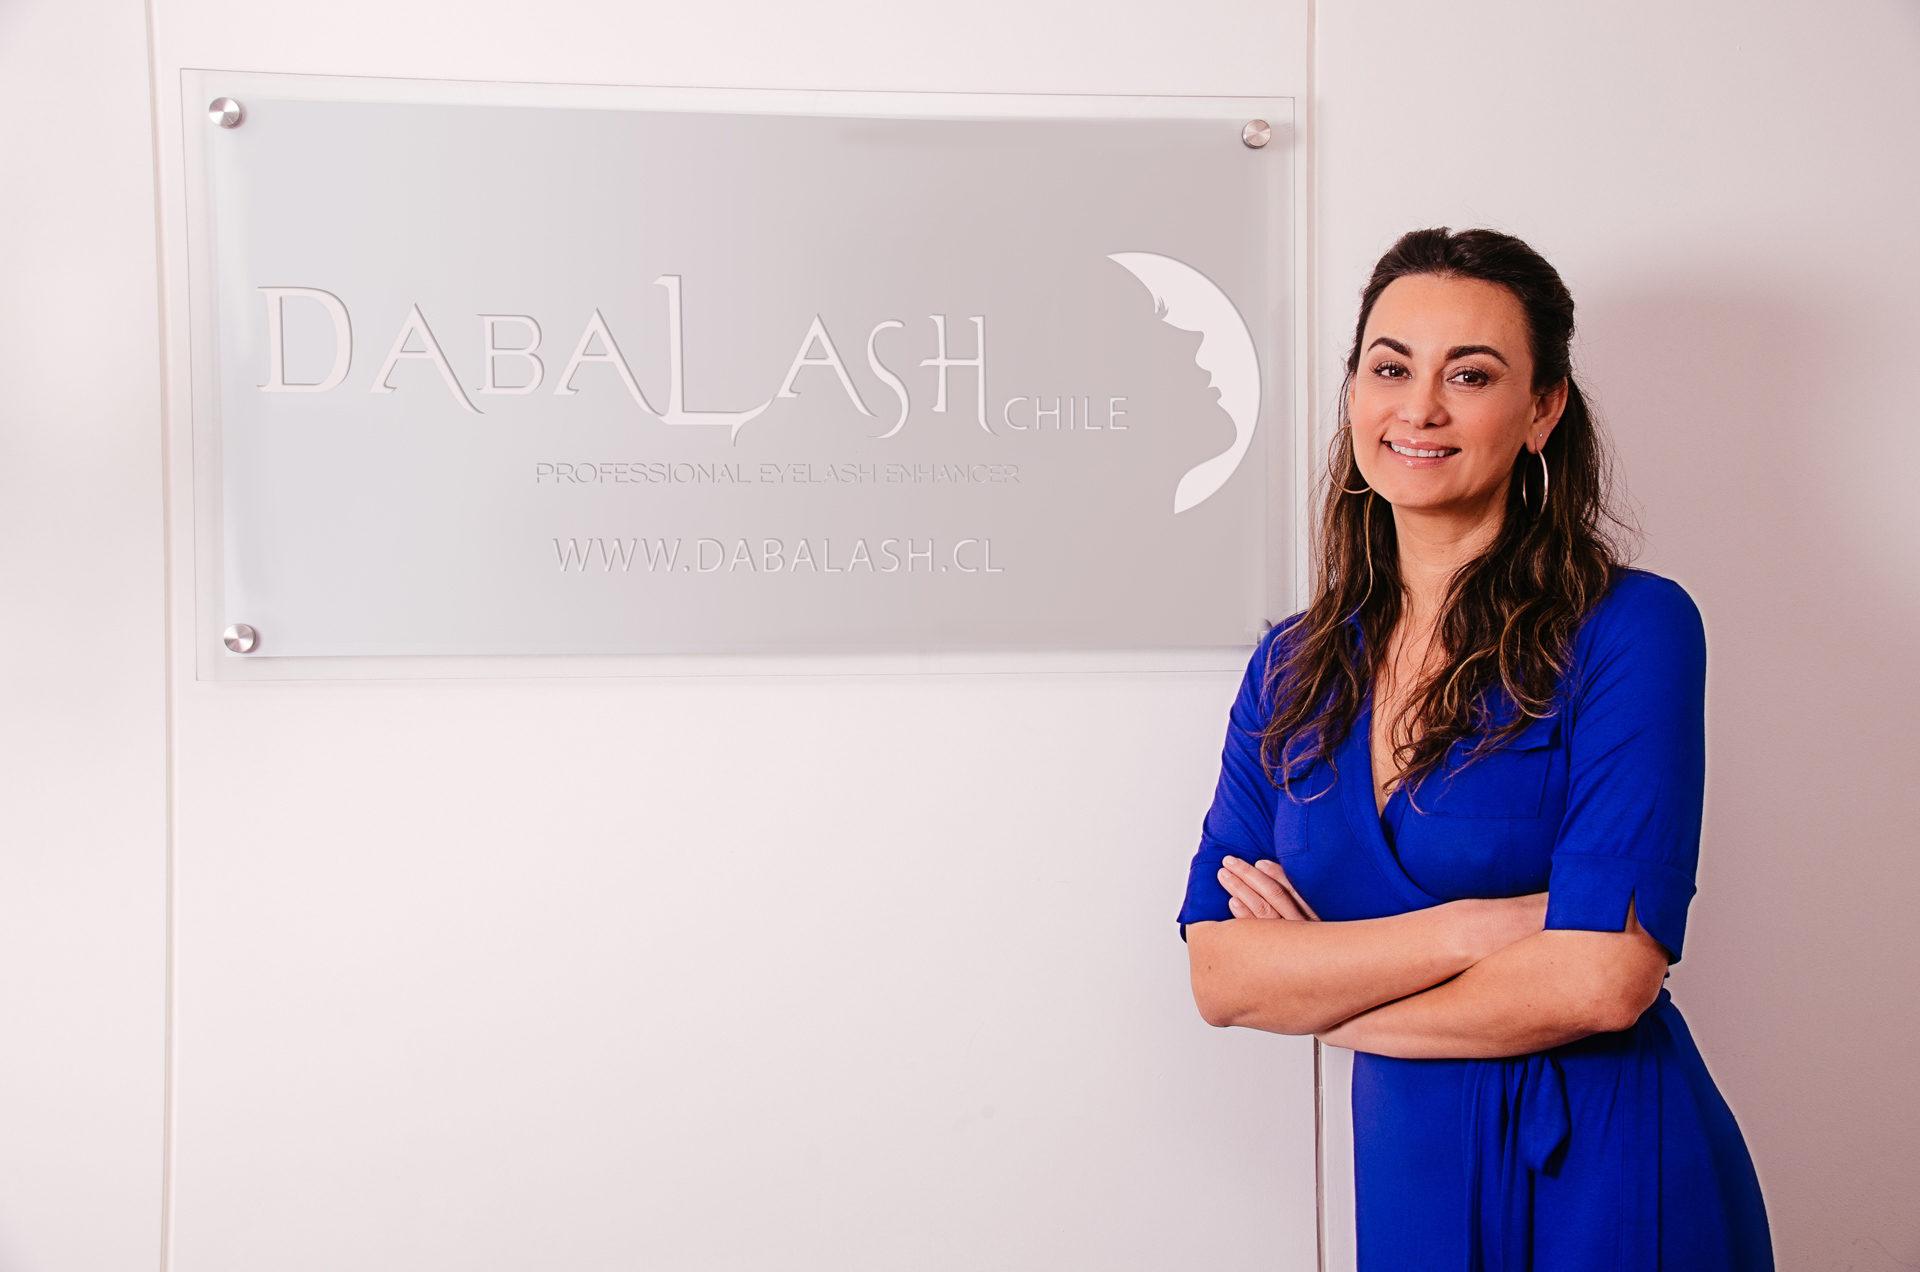 Dabalash01-FINALES-010-site